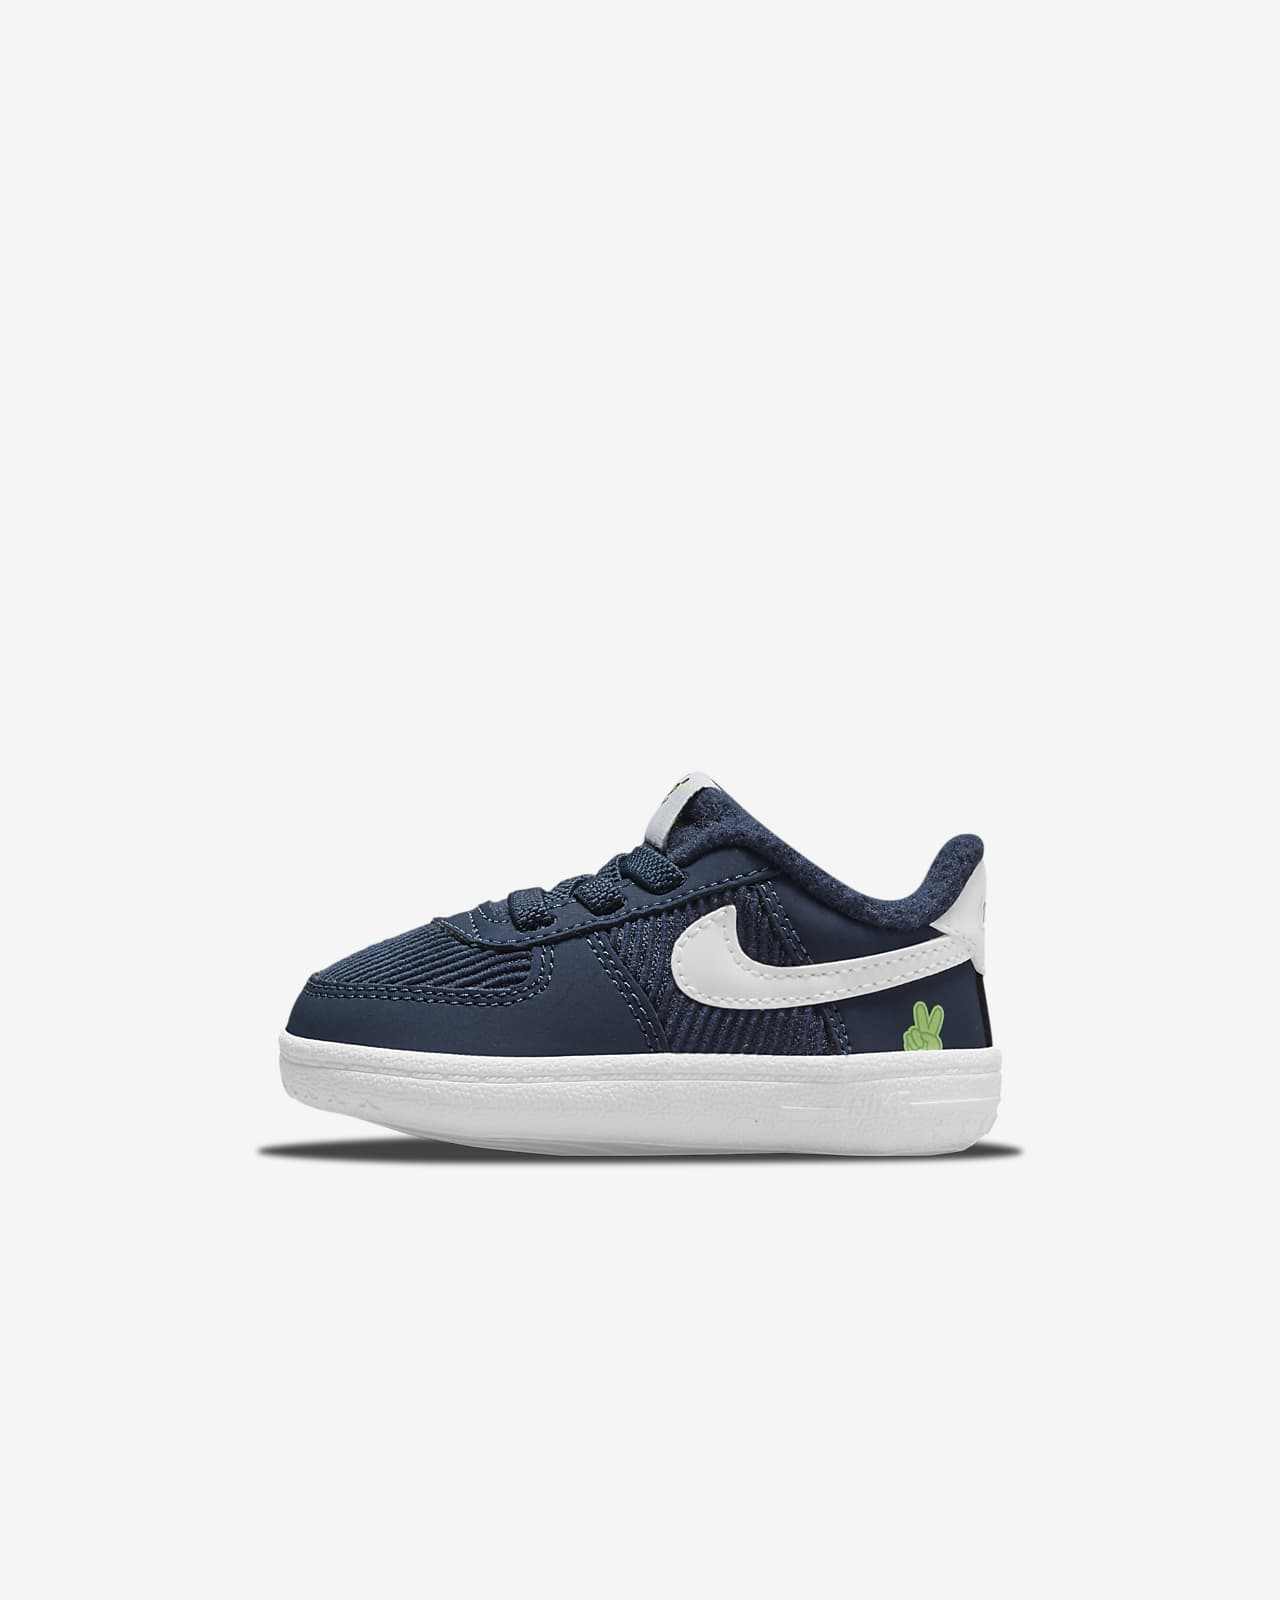 Botas Nike Force 1 SE para bebé